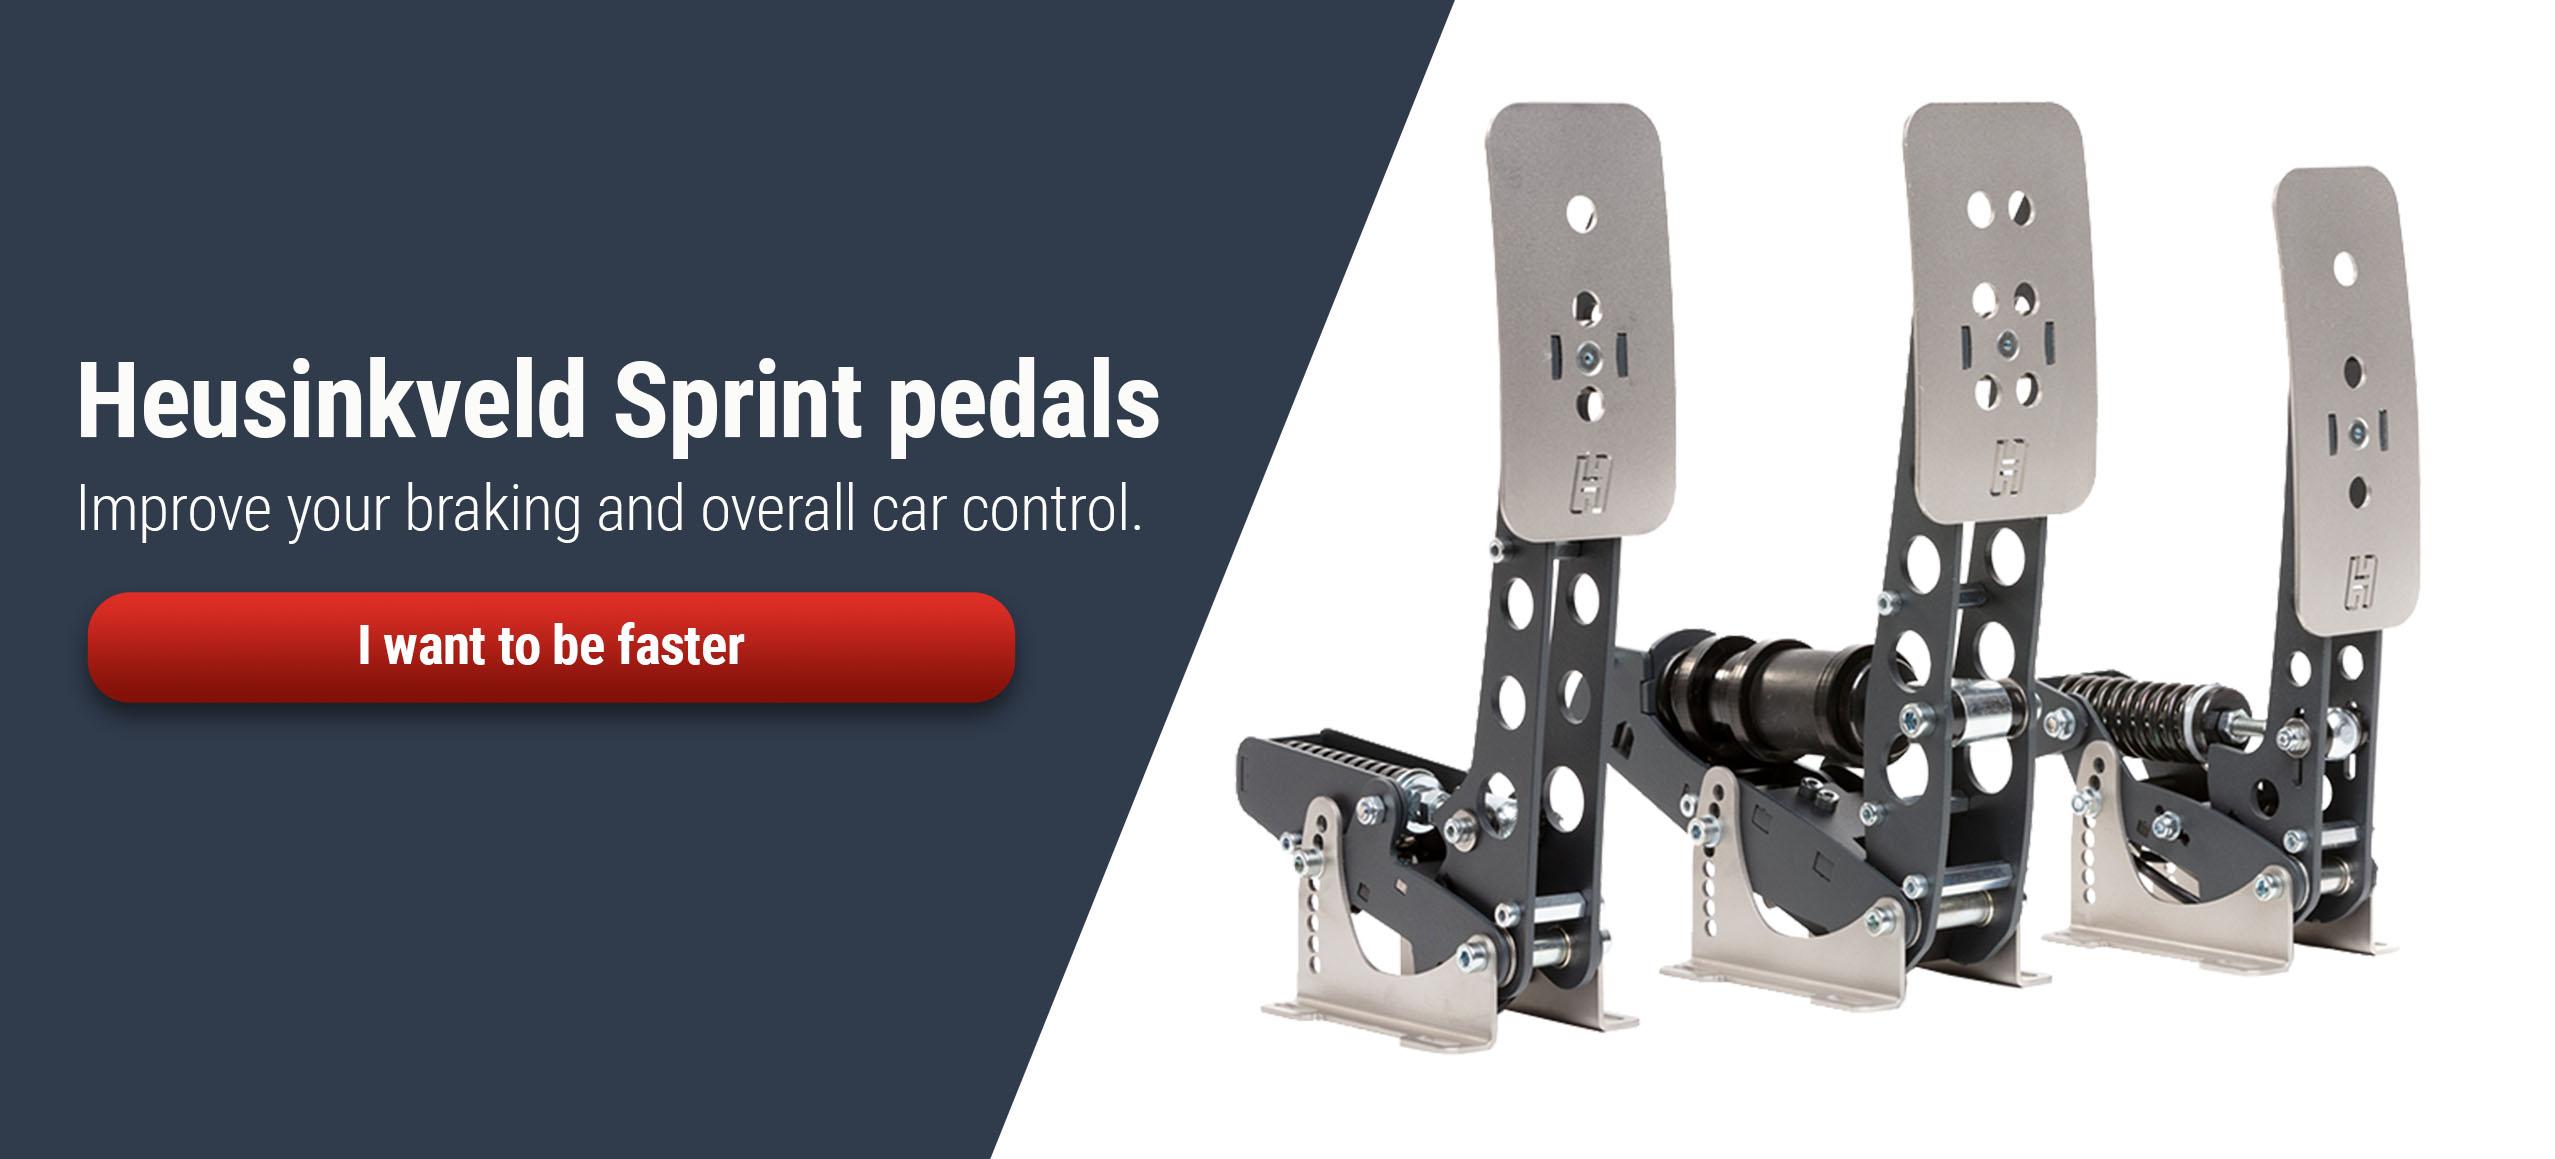 shop.gperformance.eu - Heusinkveld Sprint pedals - G-Performance alt